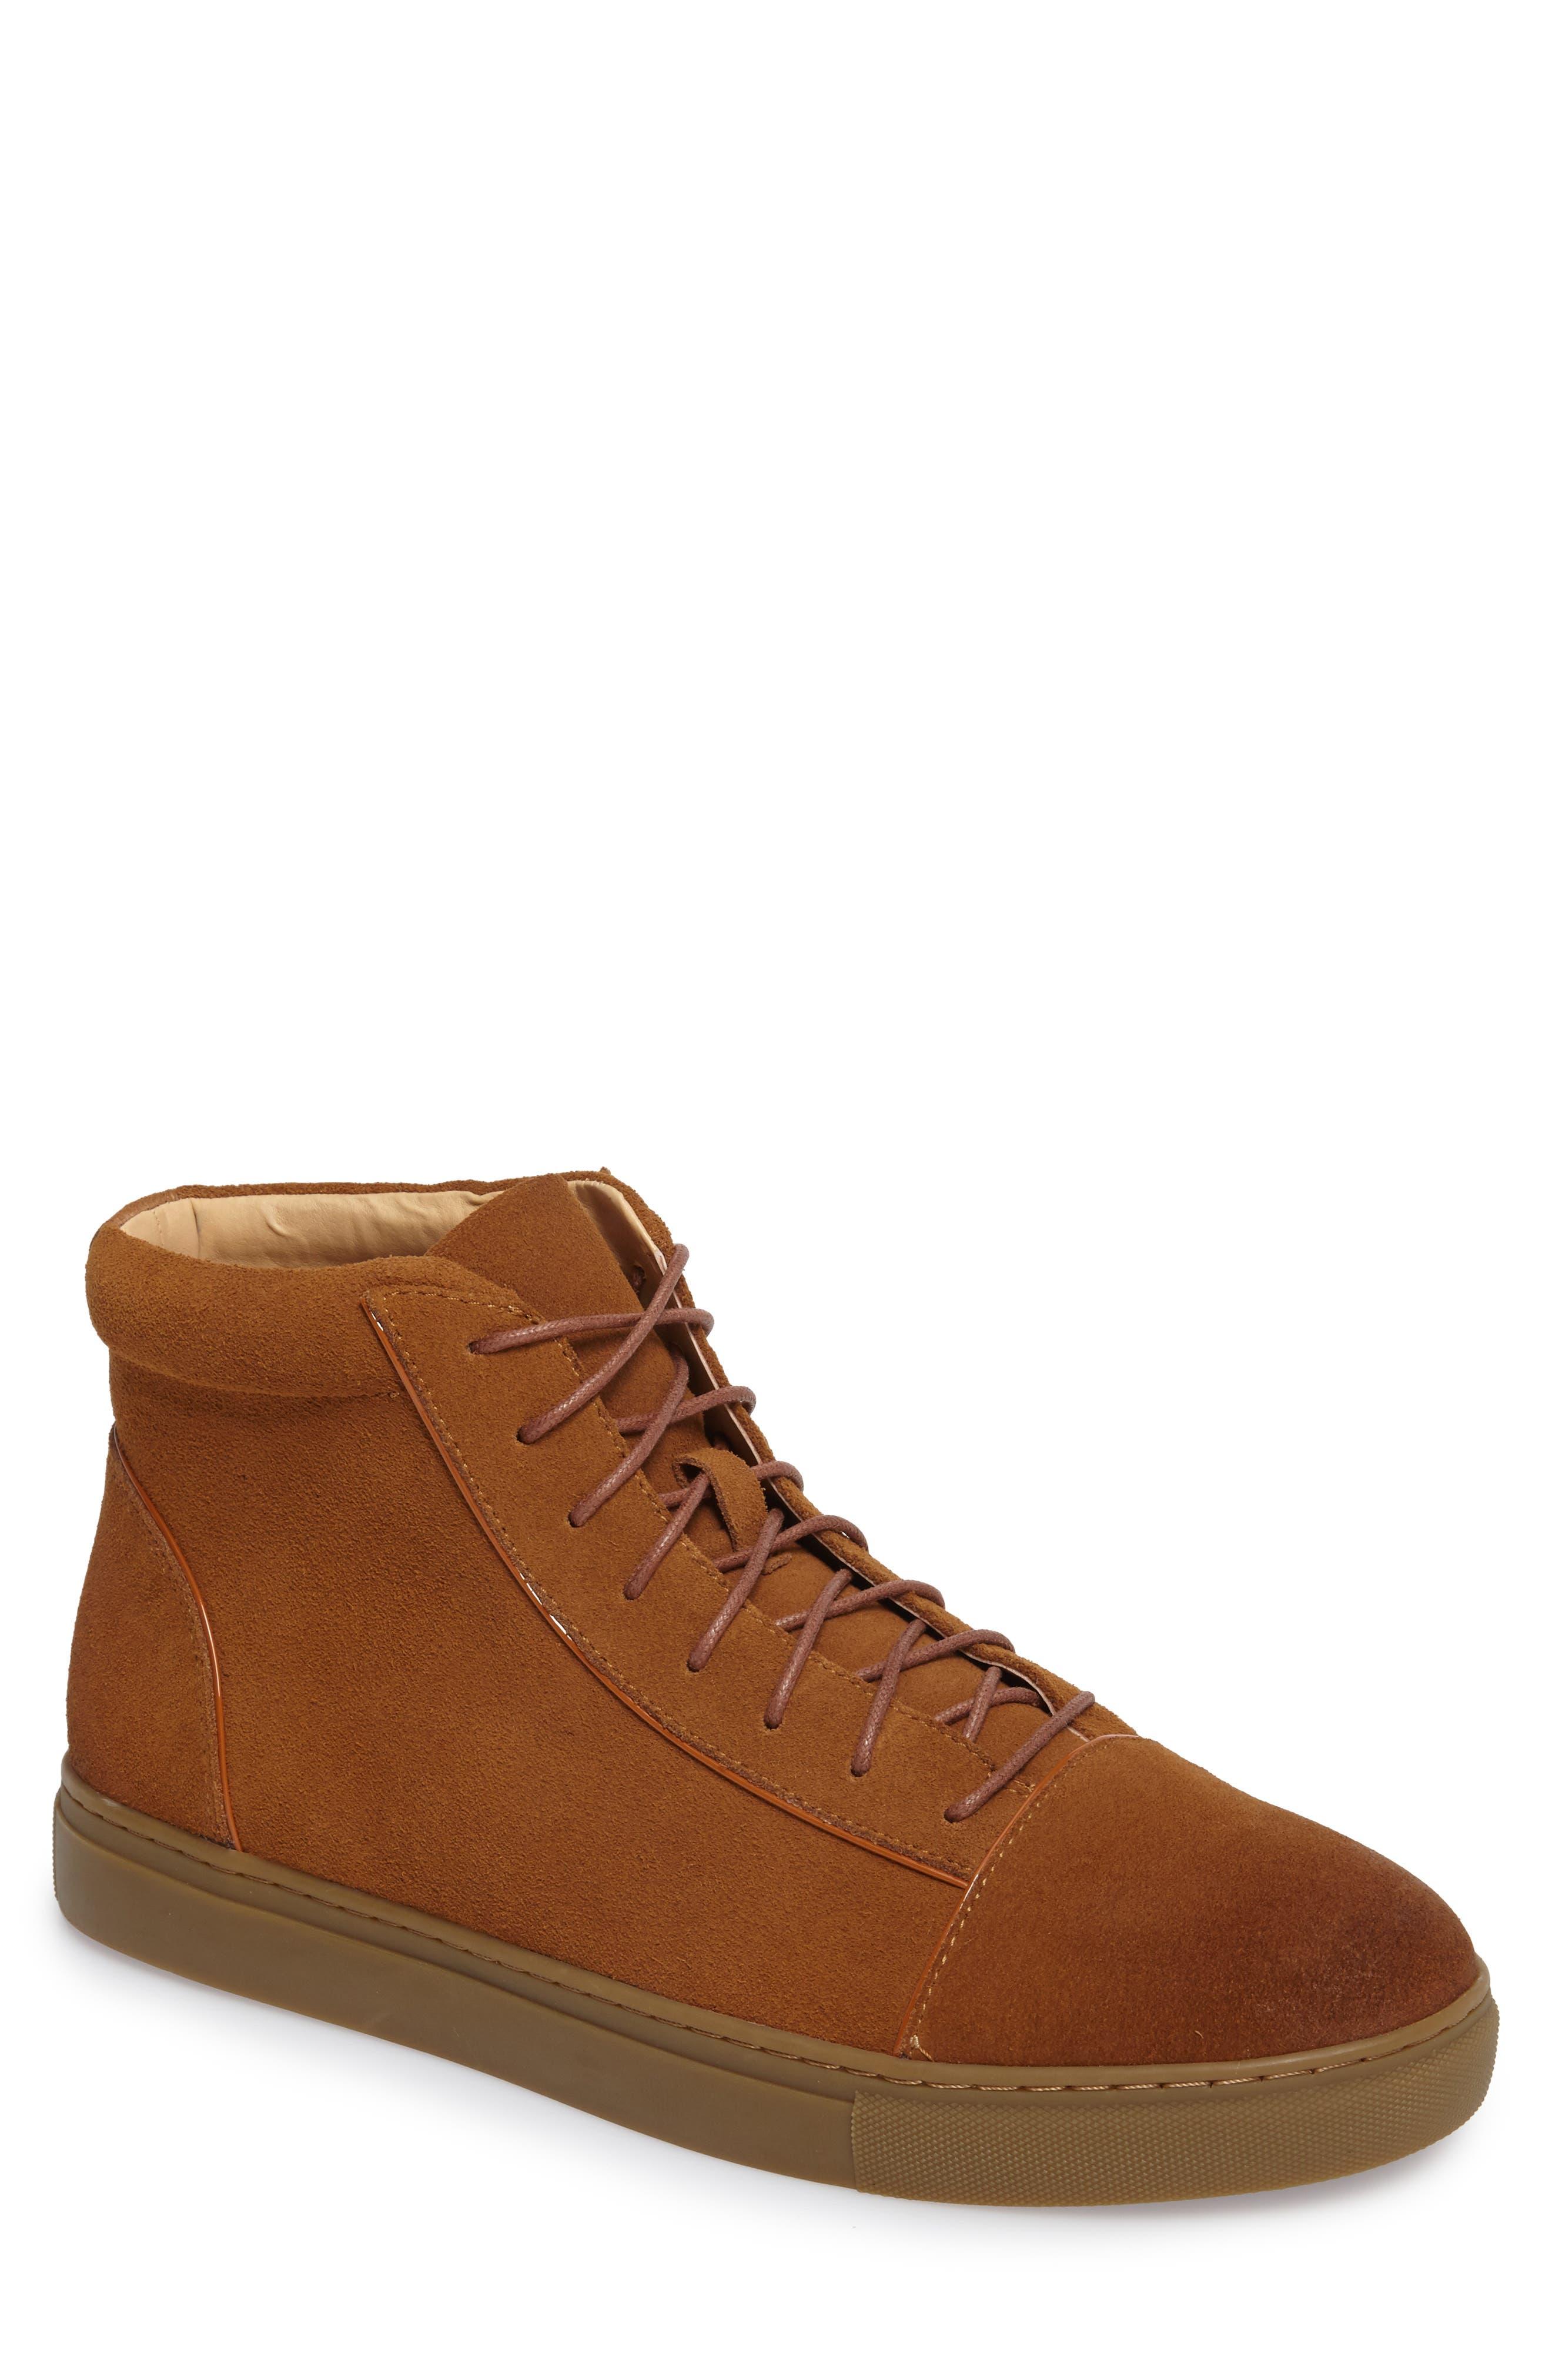 Main Image - English Laundry Grundy Sneaker (Men)